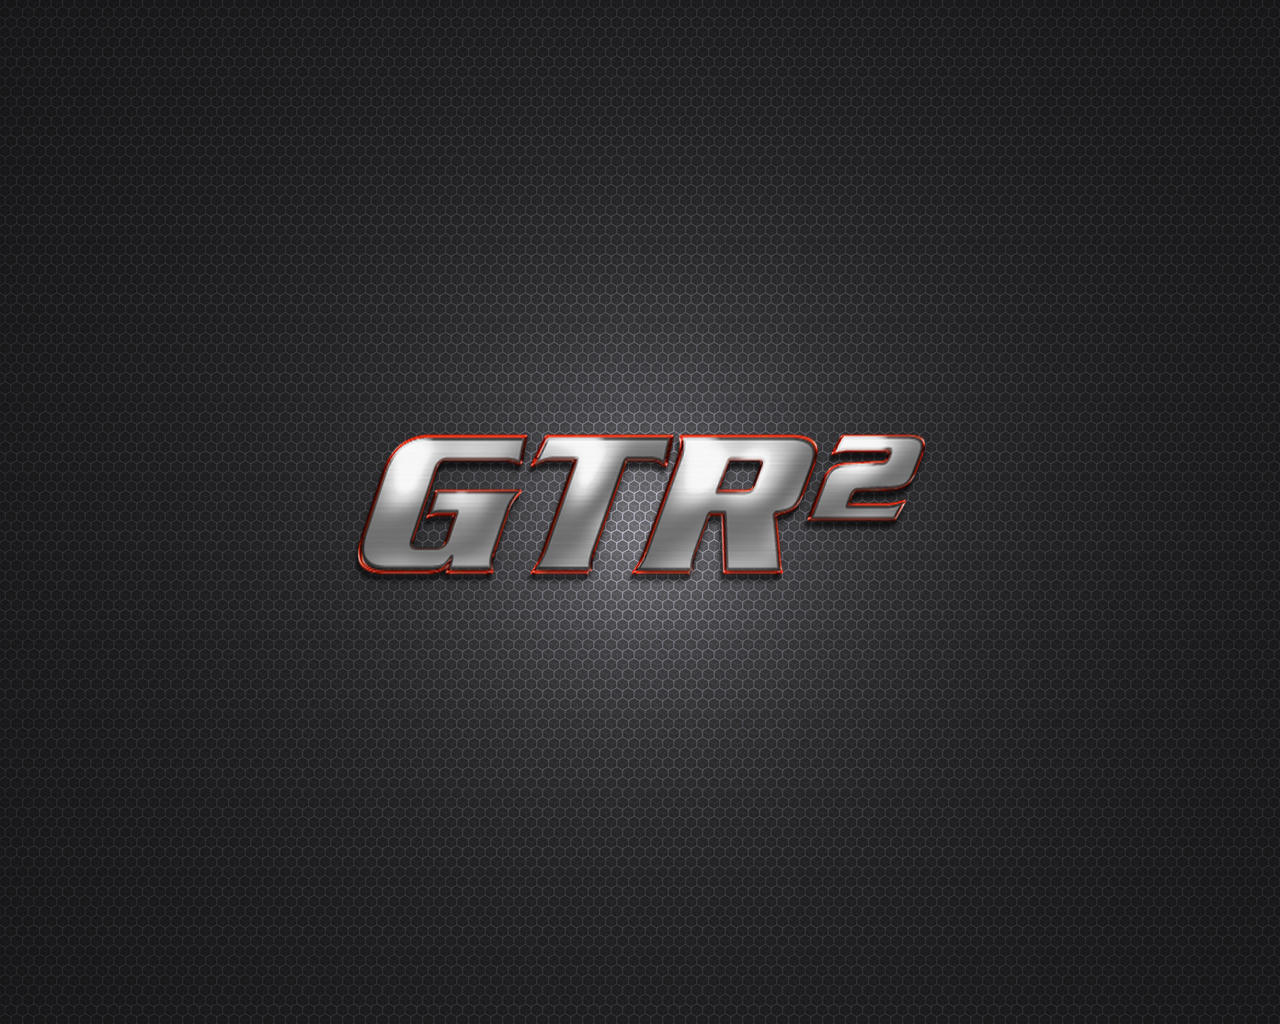 GTR 2 by iAmFreeman